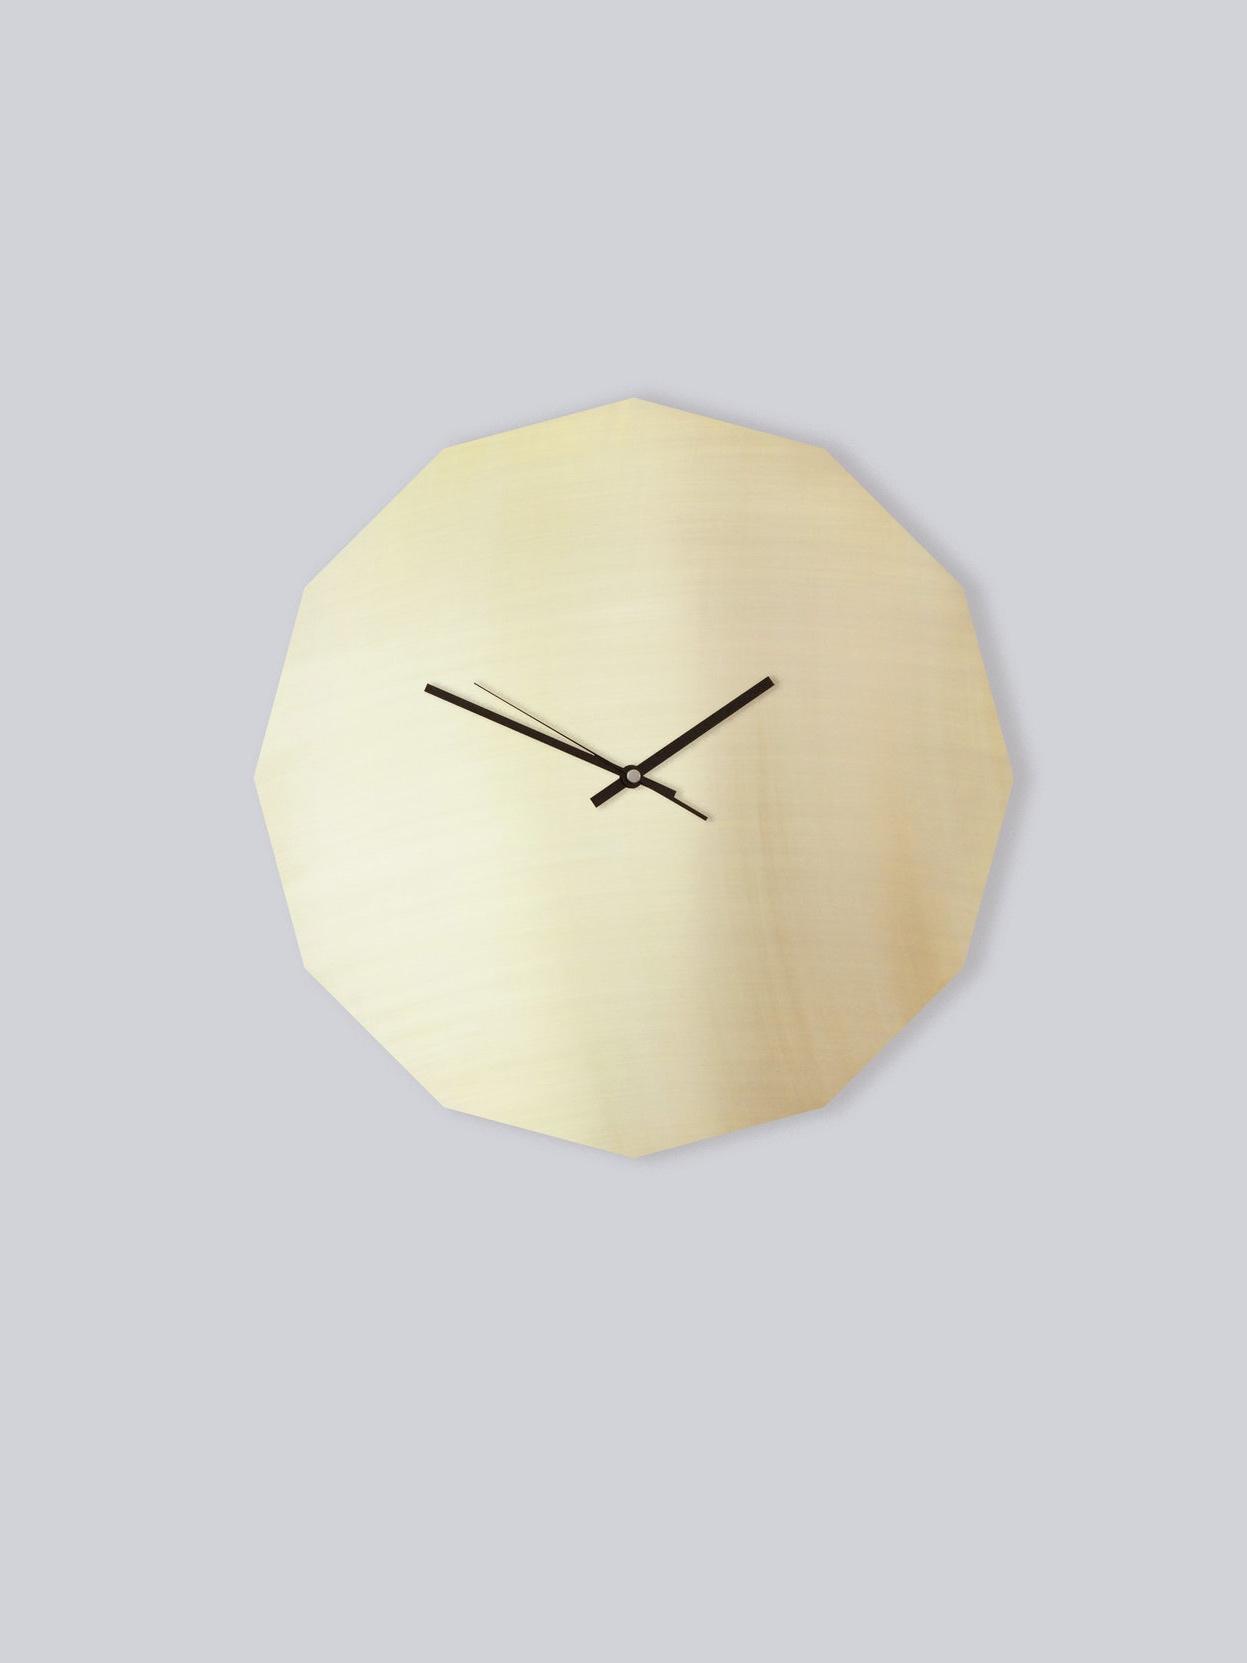 12-Eck+Uhr+grau1.jpg